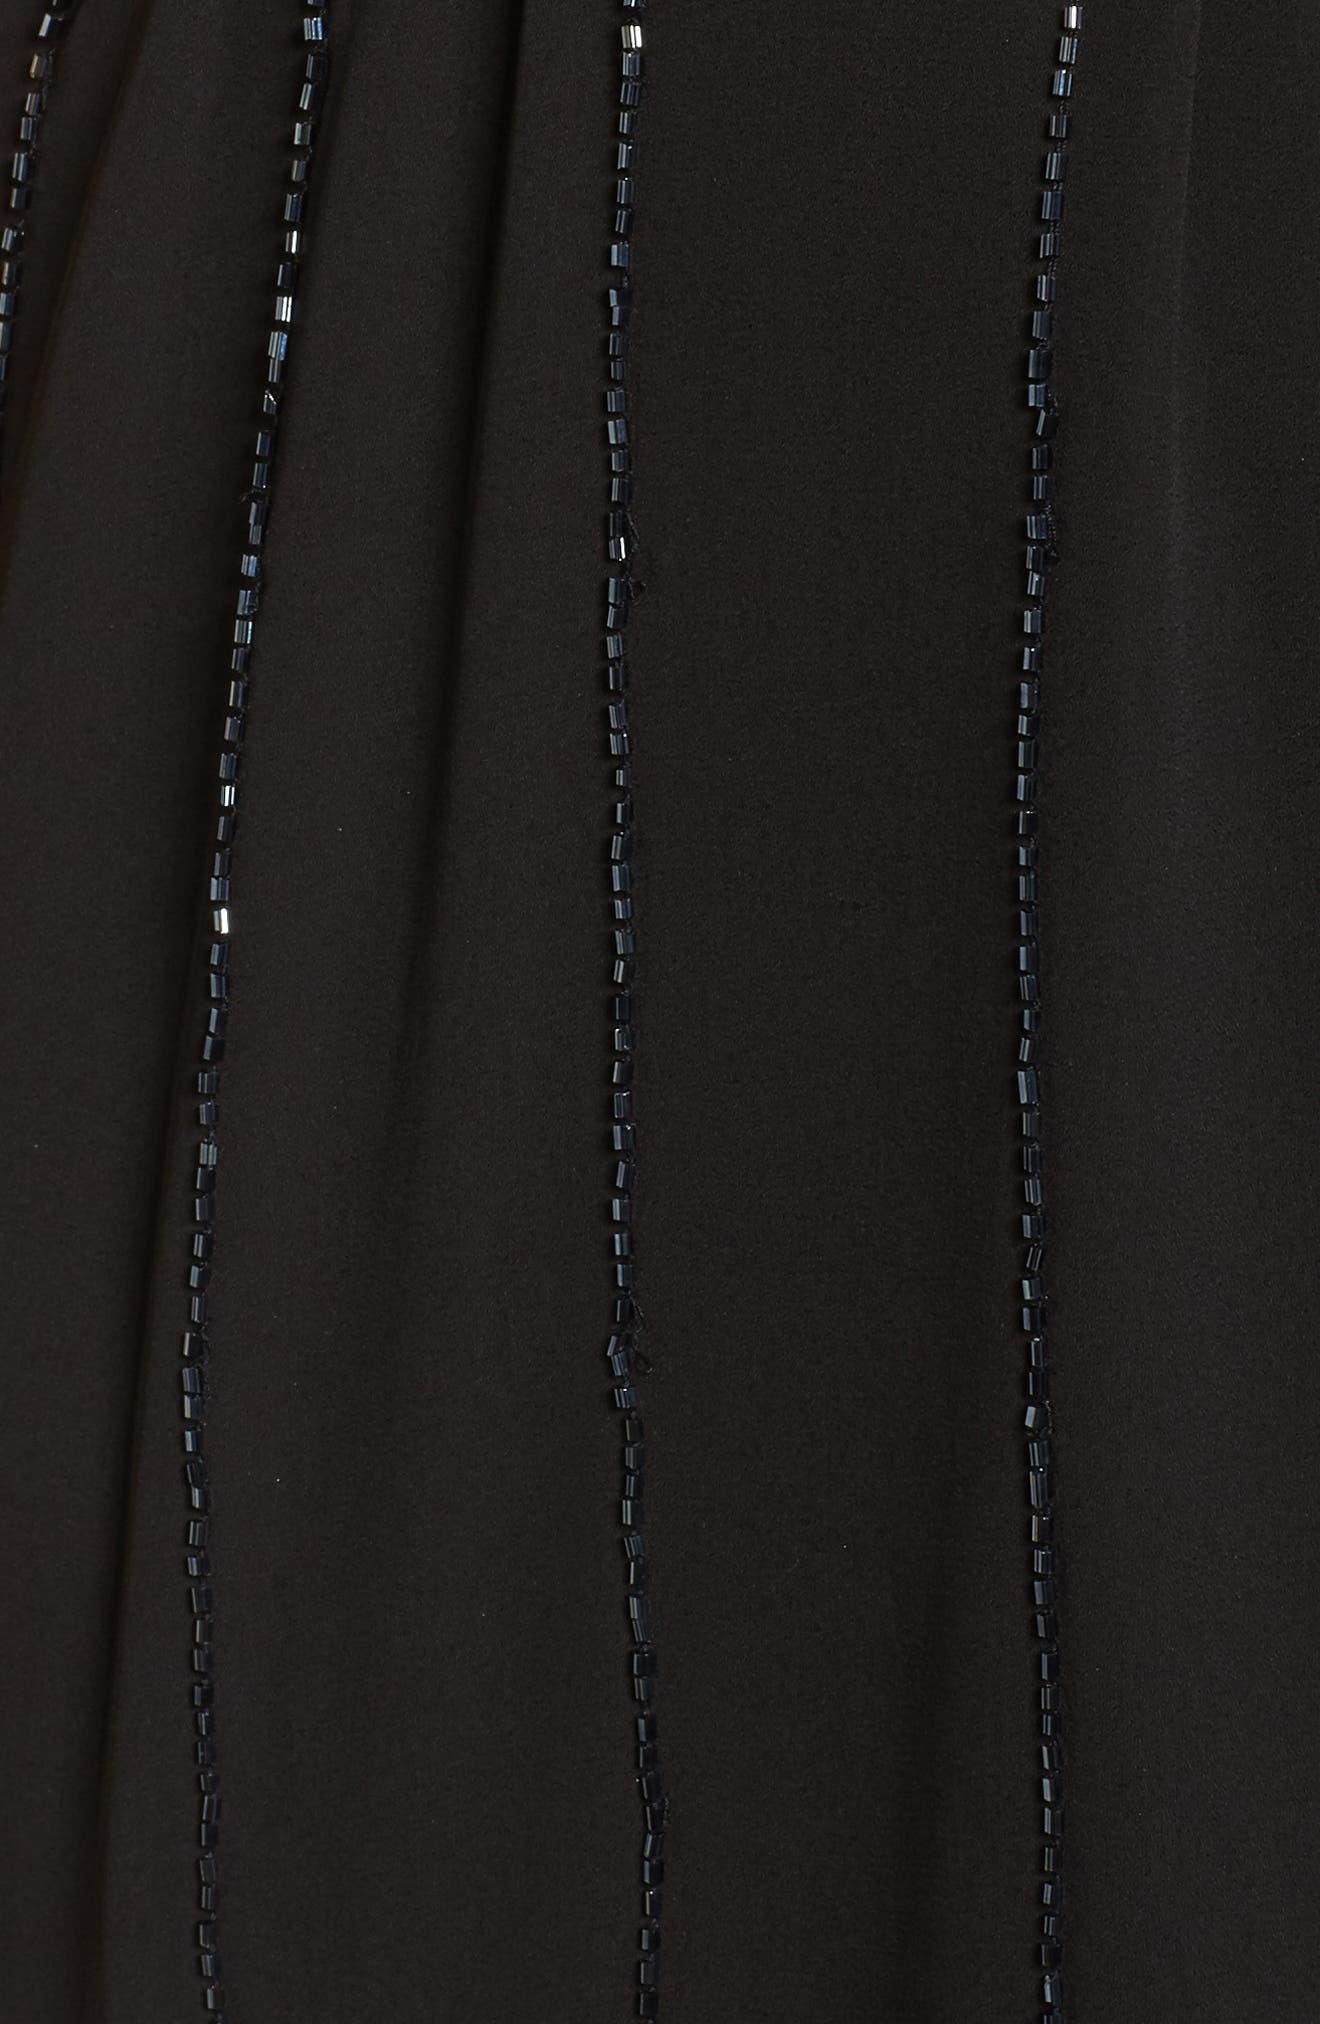 Beaded A-Line Dress,                             Alternate thumbnail 6, color,                             Black